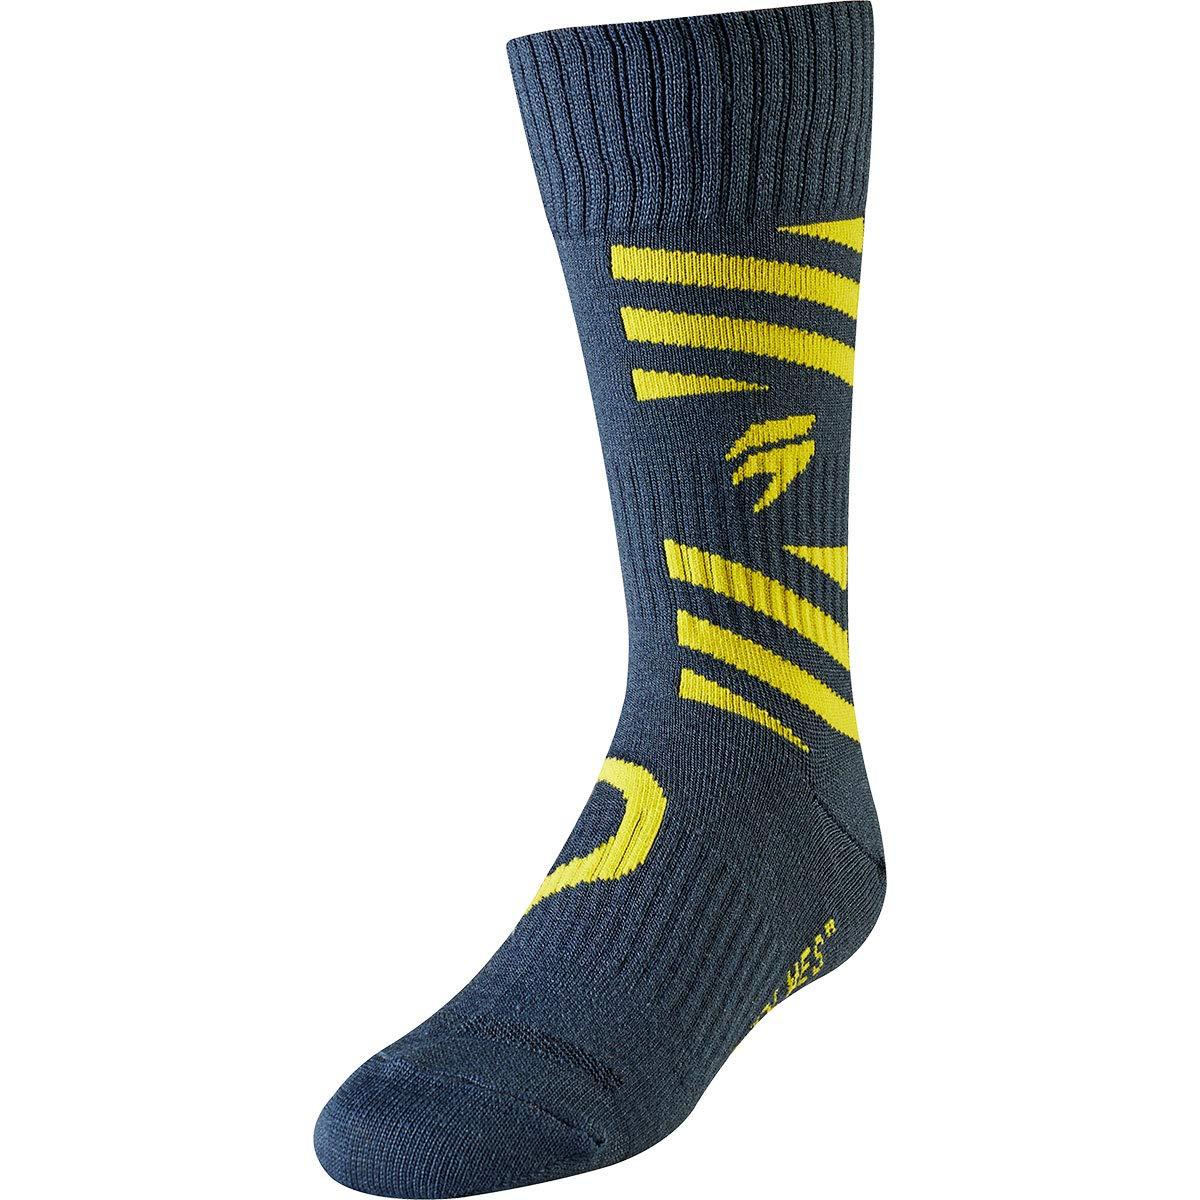 Shift 2019 Youth White Label Socks - Muse (Large/X-Large) (Navy/Yellow)